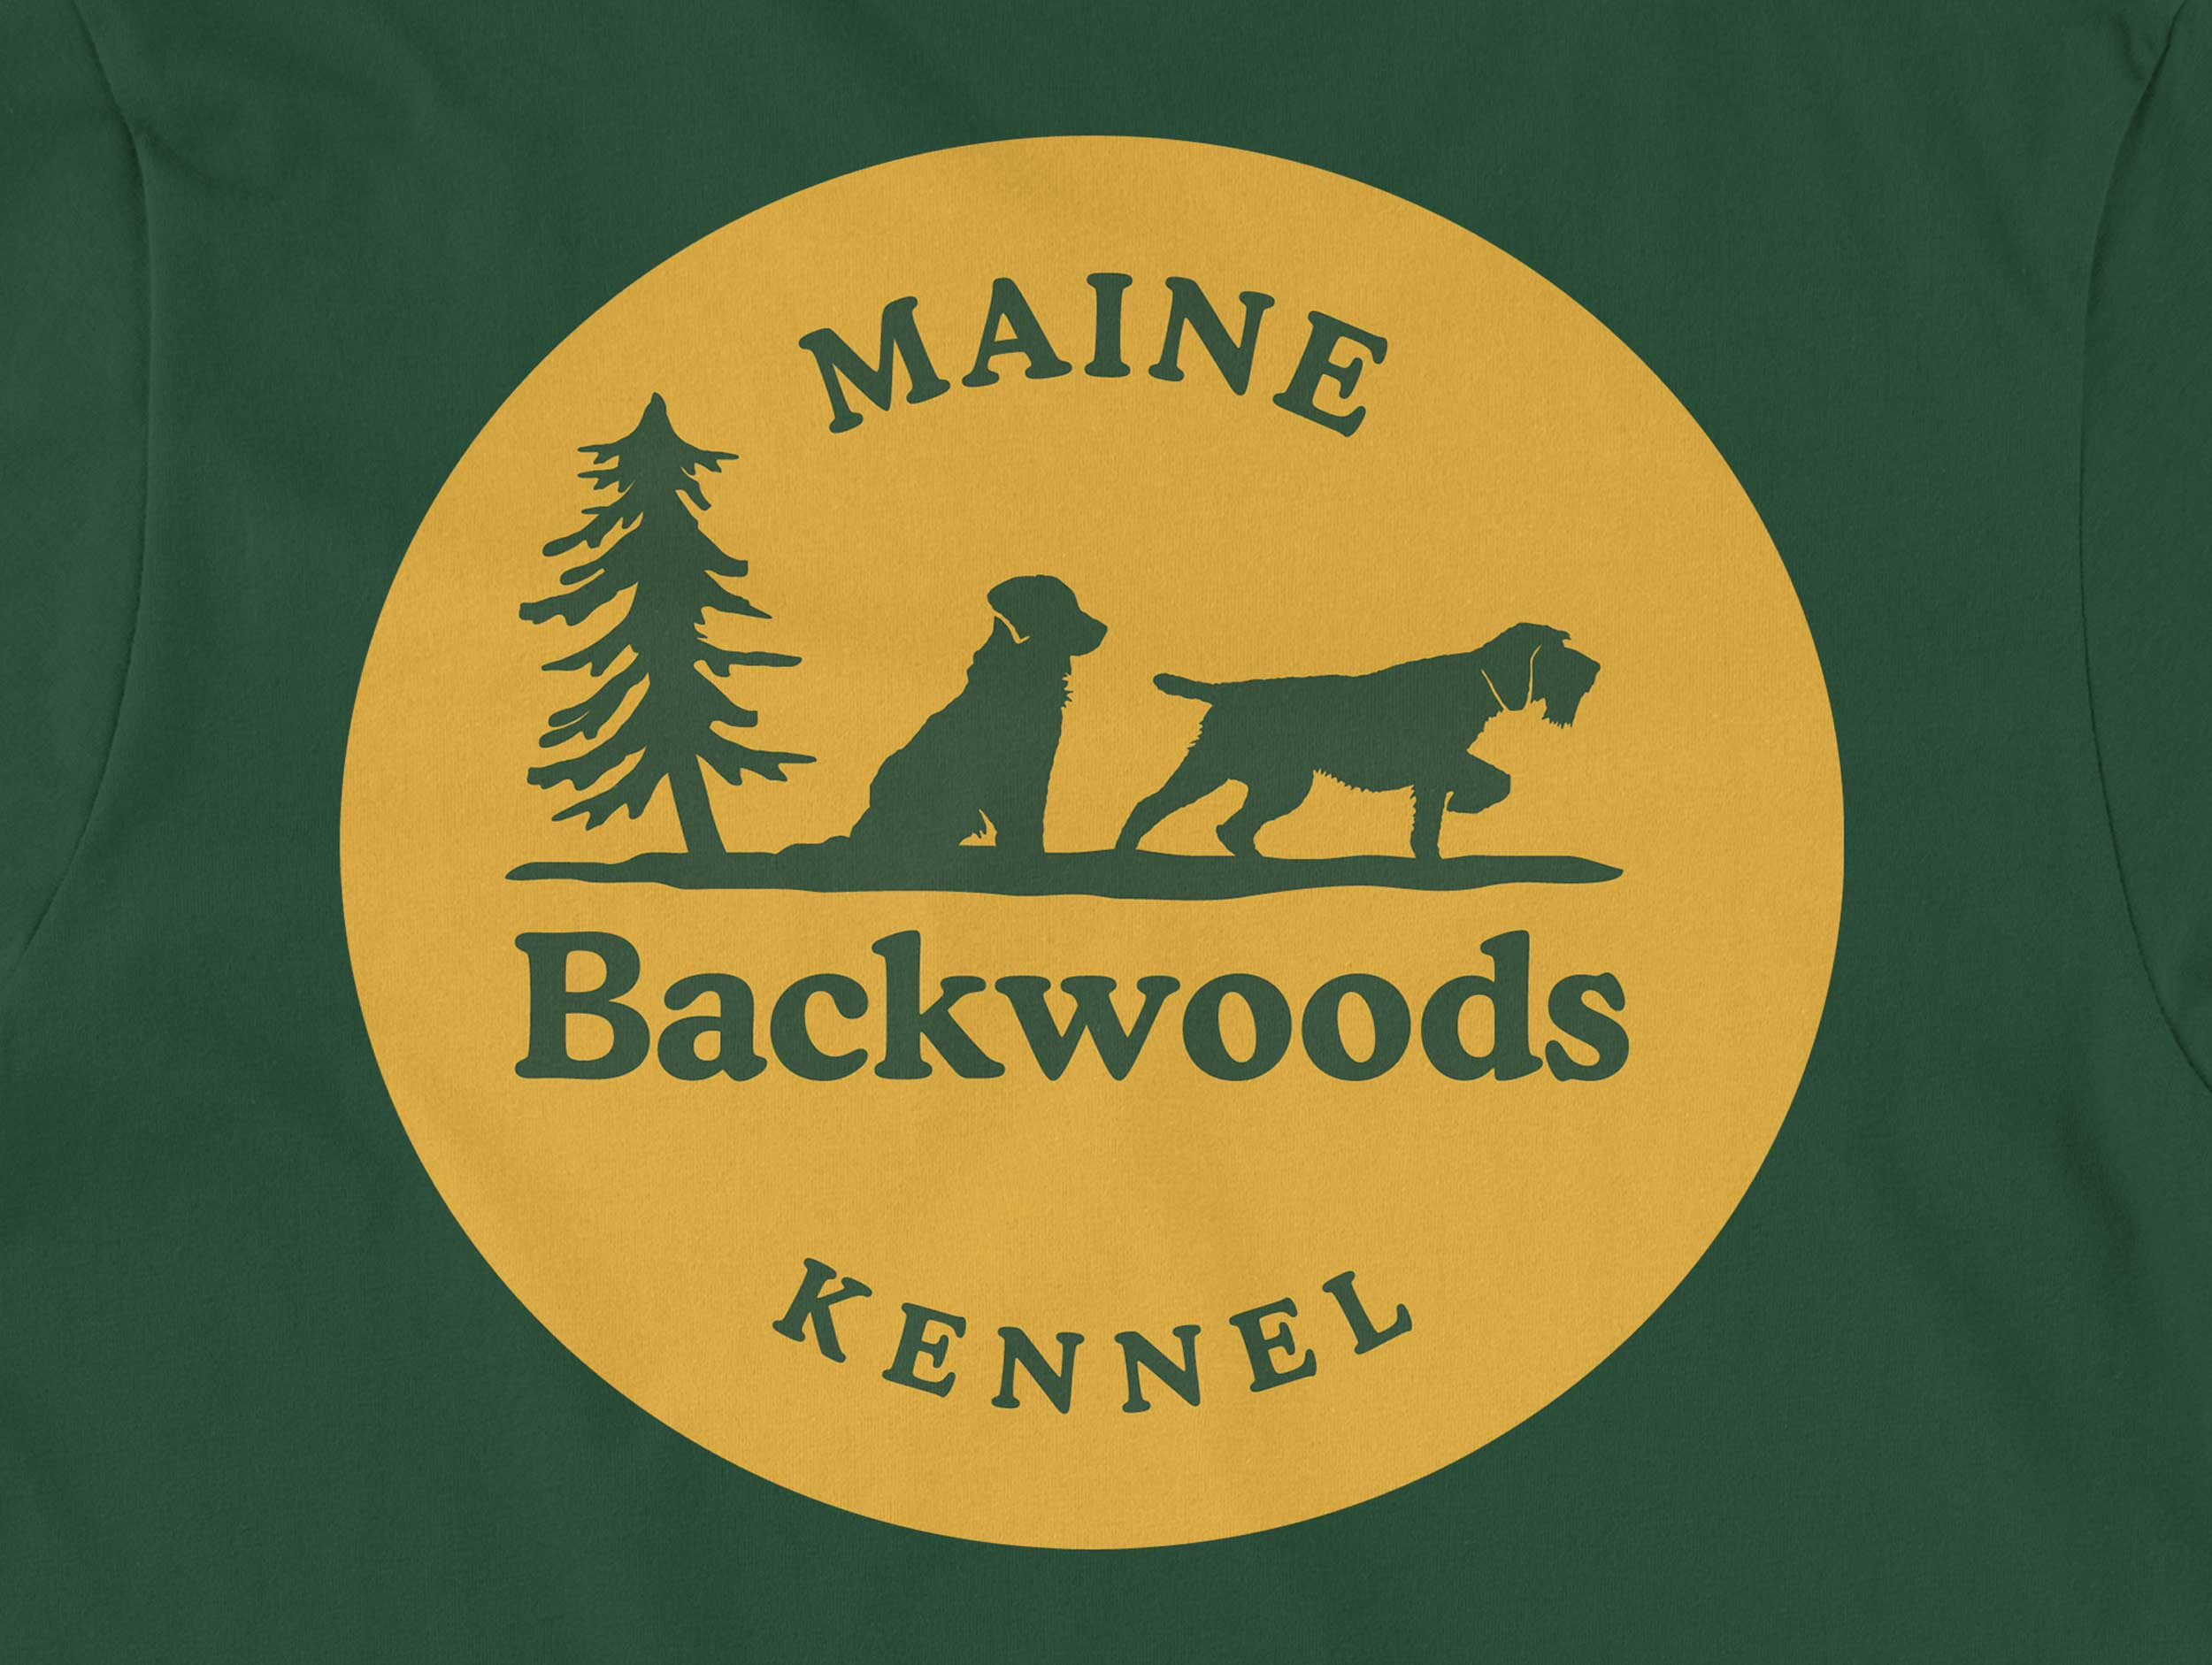 dog breeder logo design by Mike Hosier